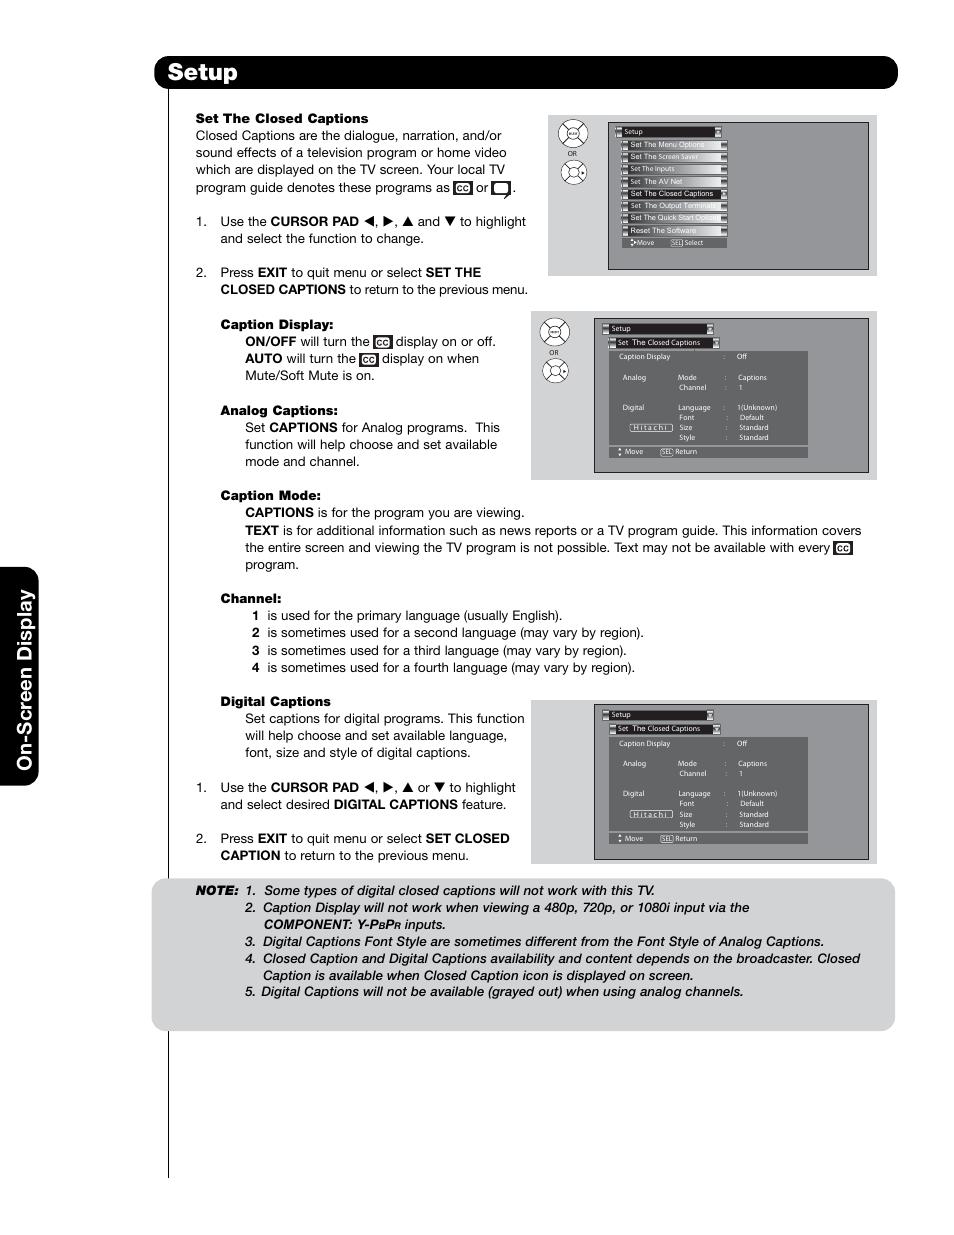 setup on scr een display hitachi 55hdt79 user manual page 76 rh manualsdir com Verizon LG User Manual Honeywell Pressuretrol Manual